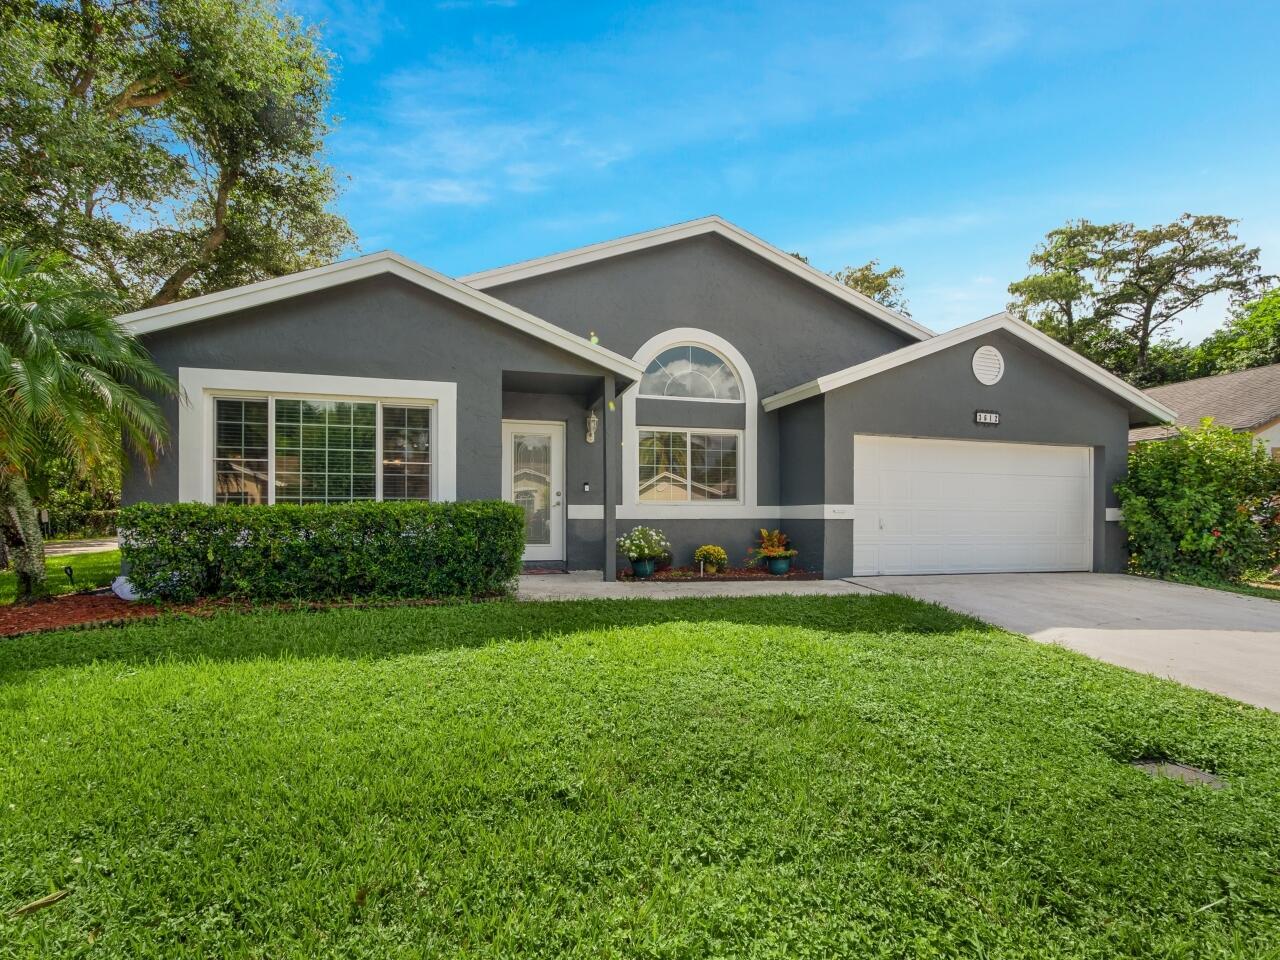 3612 59th, Coconut Creek, Florida 33073